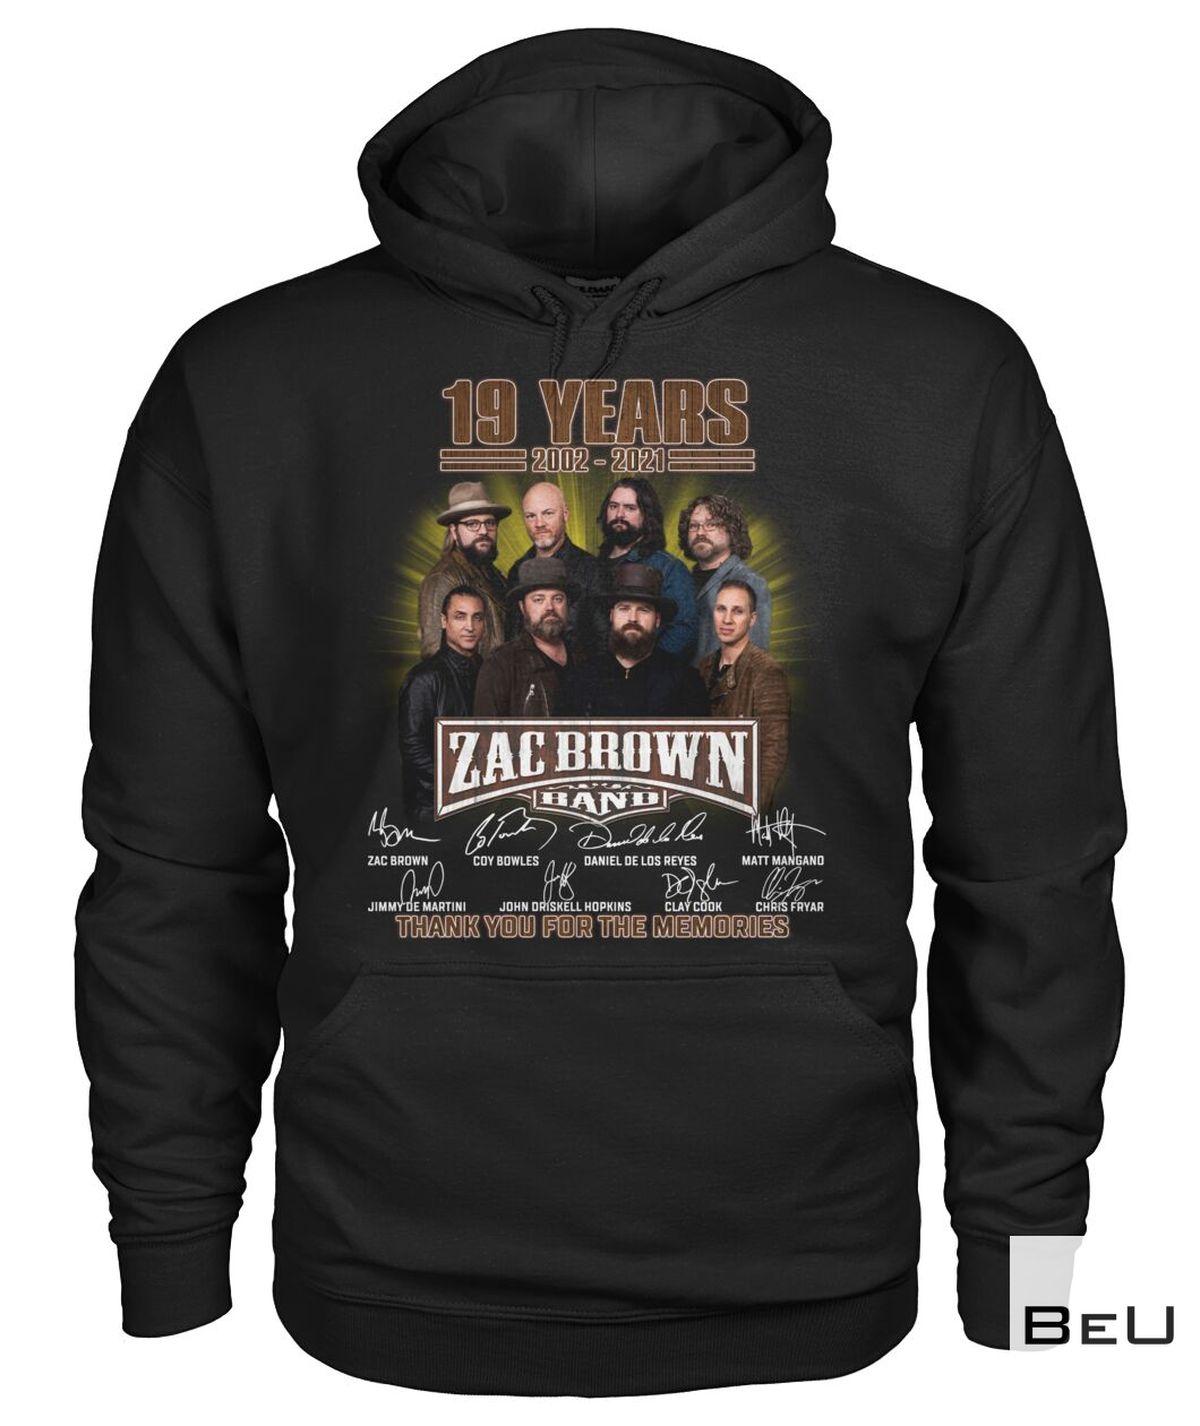 Beautiful Zac Brown Band 19th Anniversary Shirt, hoodie, tank top